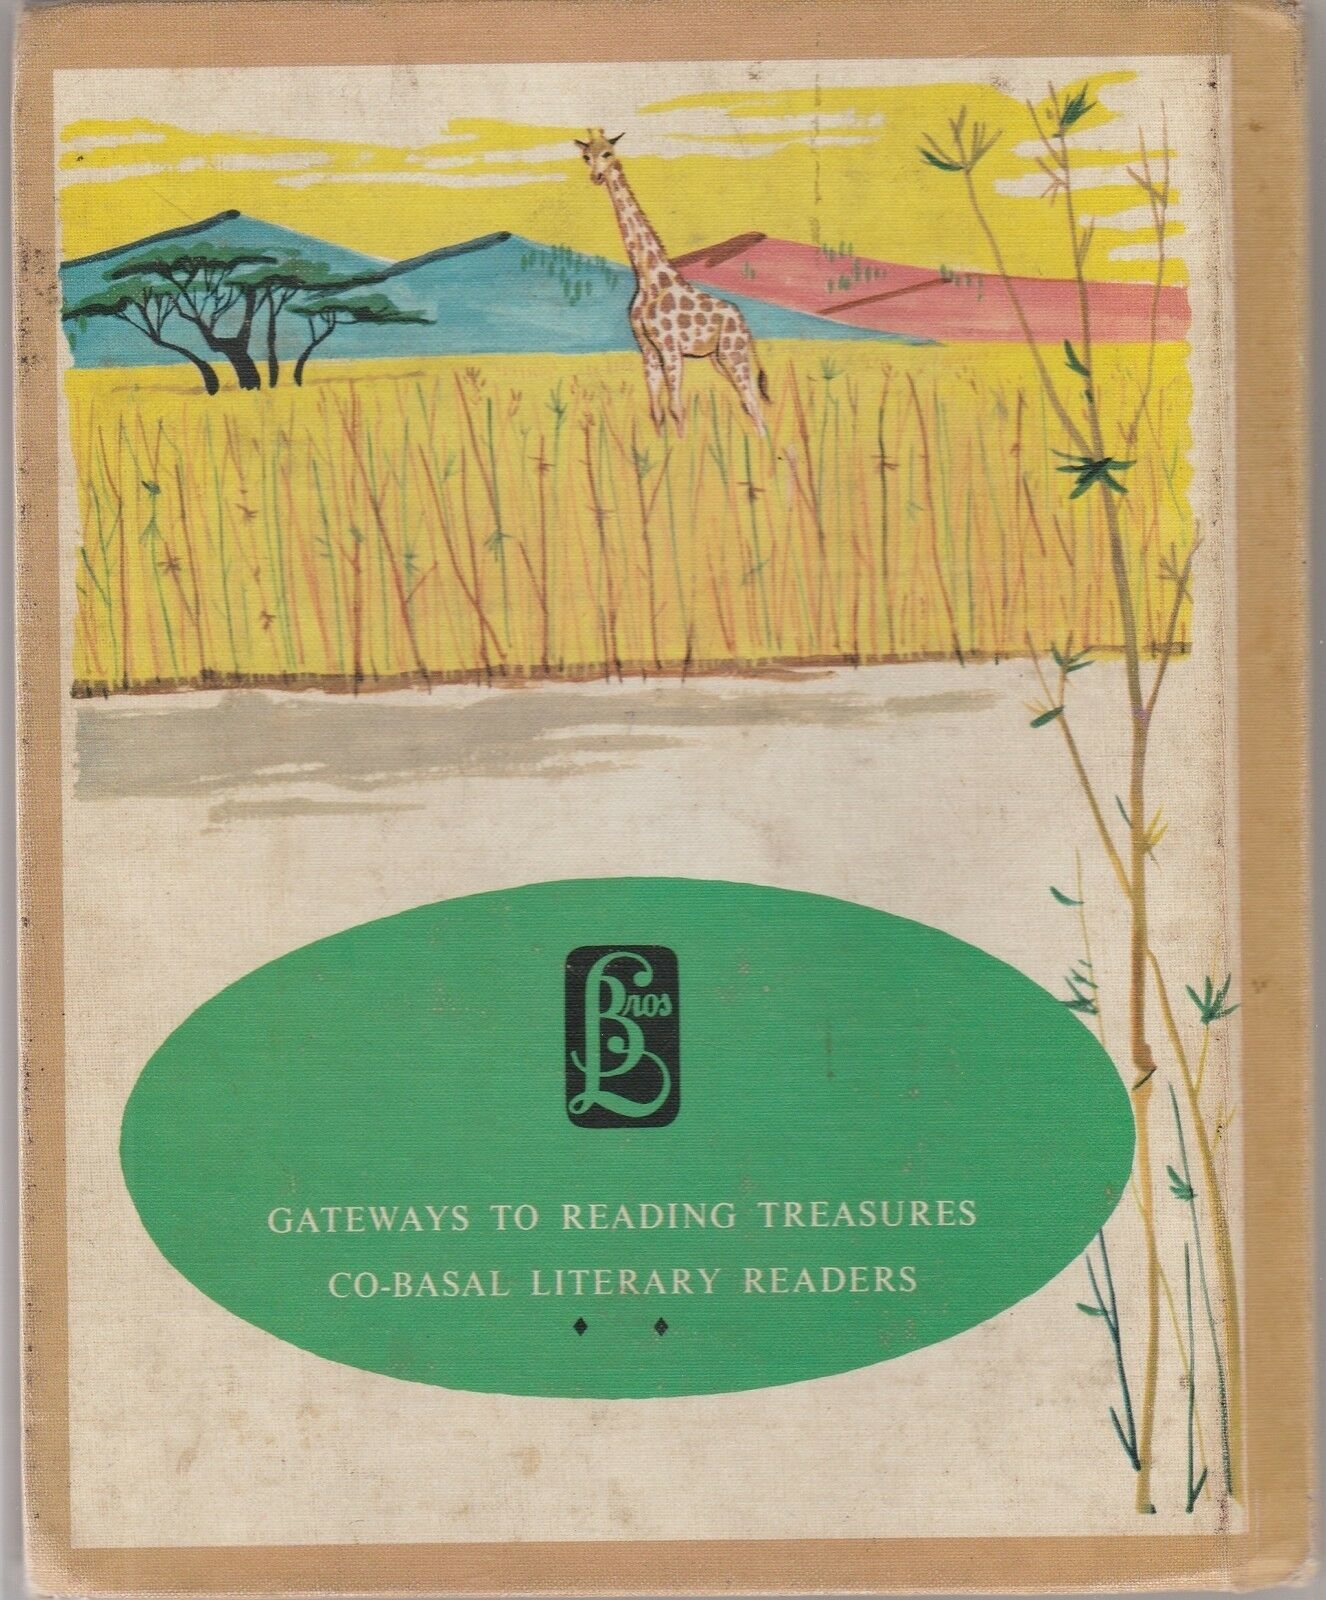 Storyland Favorites 1964 Laidlaw Gateways to Reading Treasures School Reader